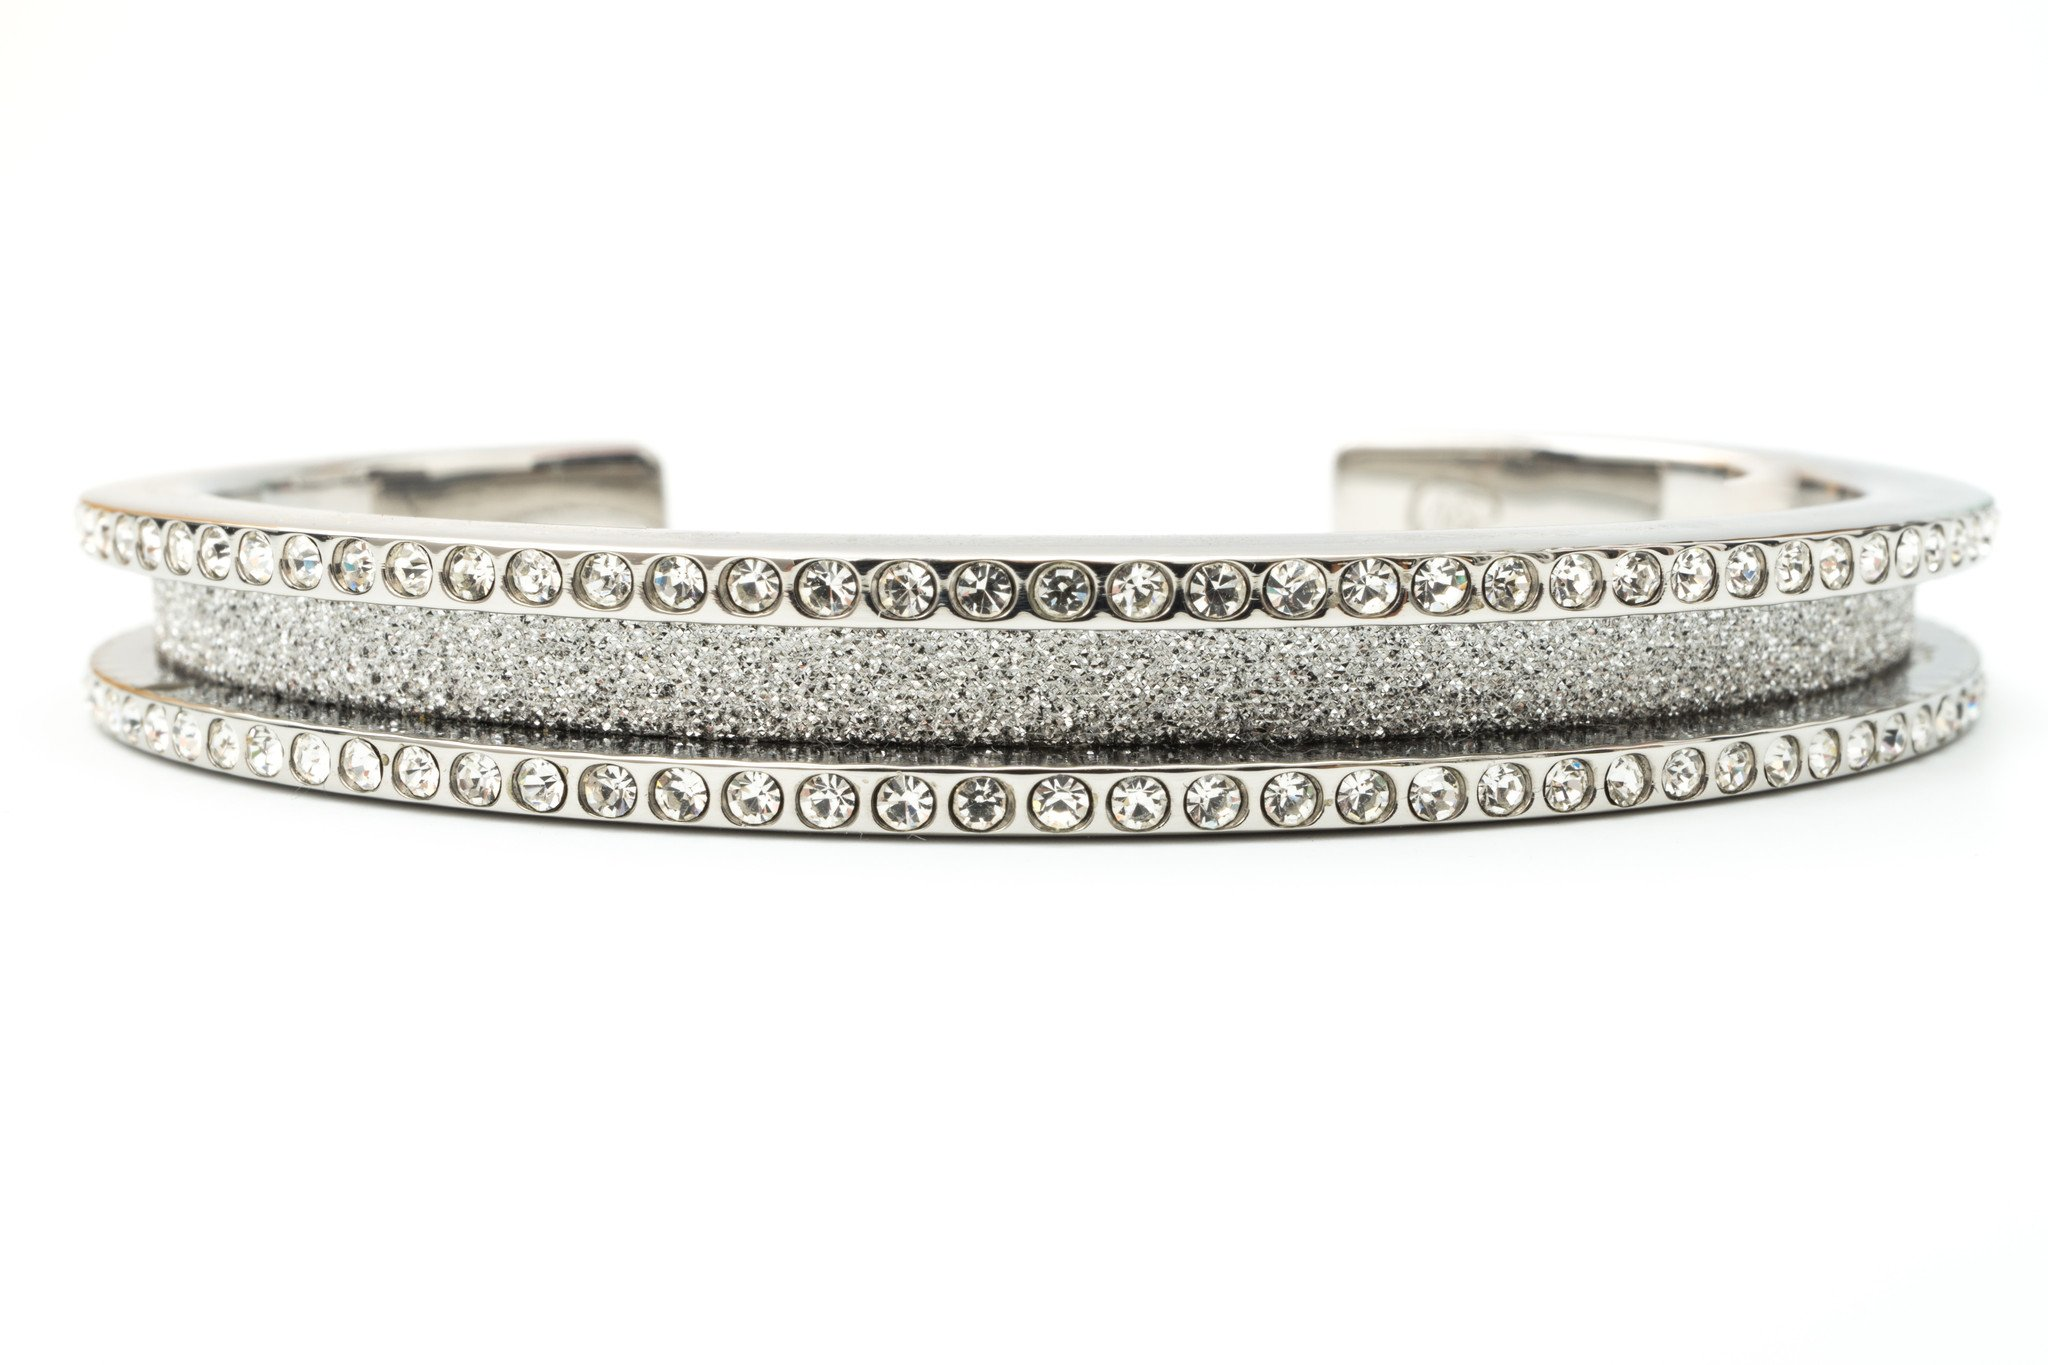 Hair Tie Bracelet - Elegance by Maria Shireen - Steel Silver - Medium by Maria Shireen